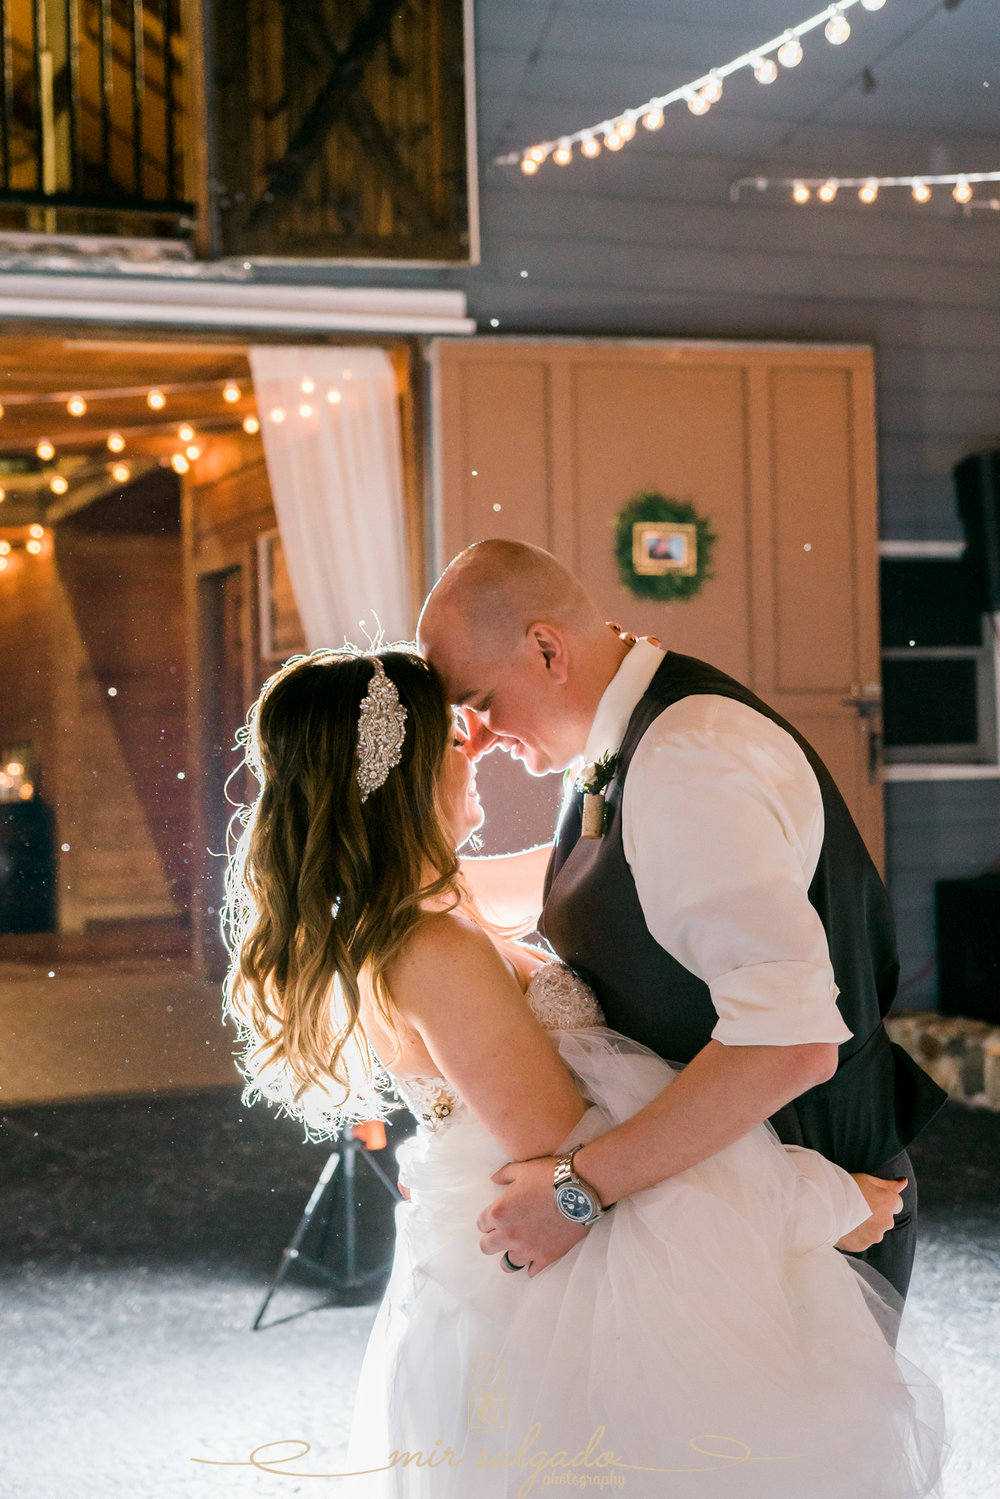 first-dance-wedding-photo, The-Lange-farm-wedding-photo